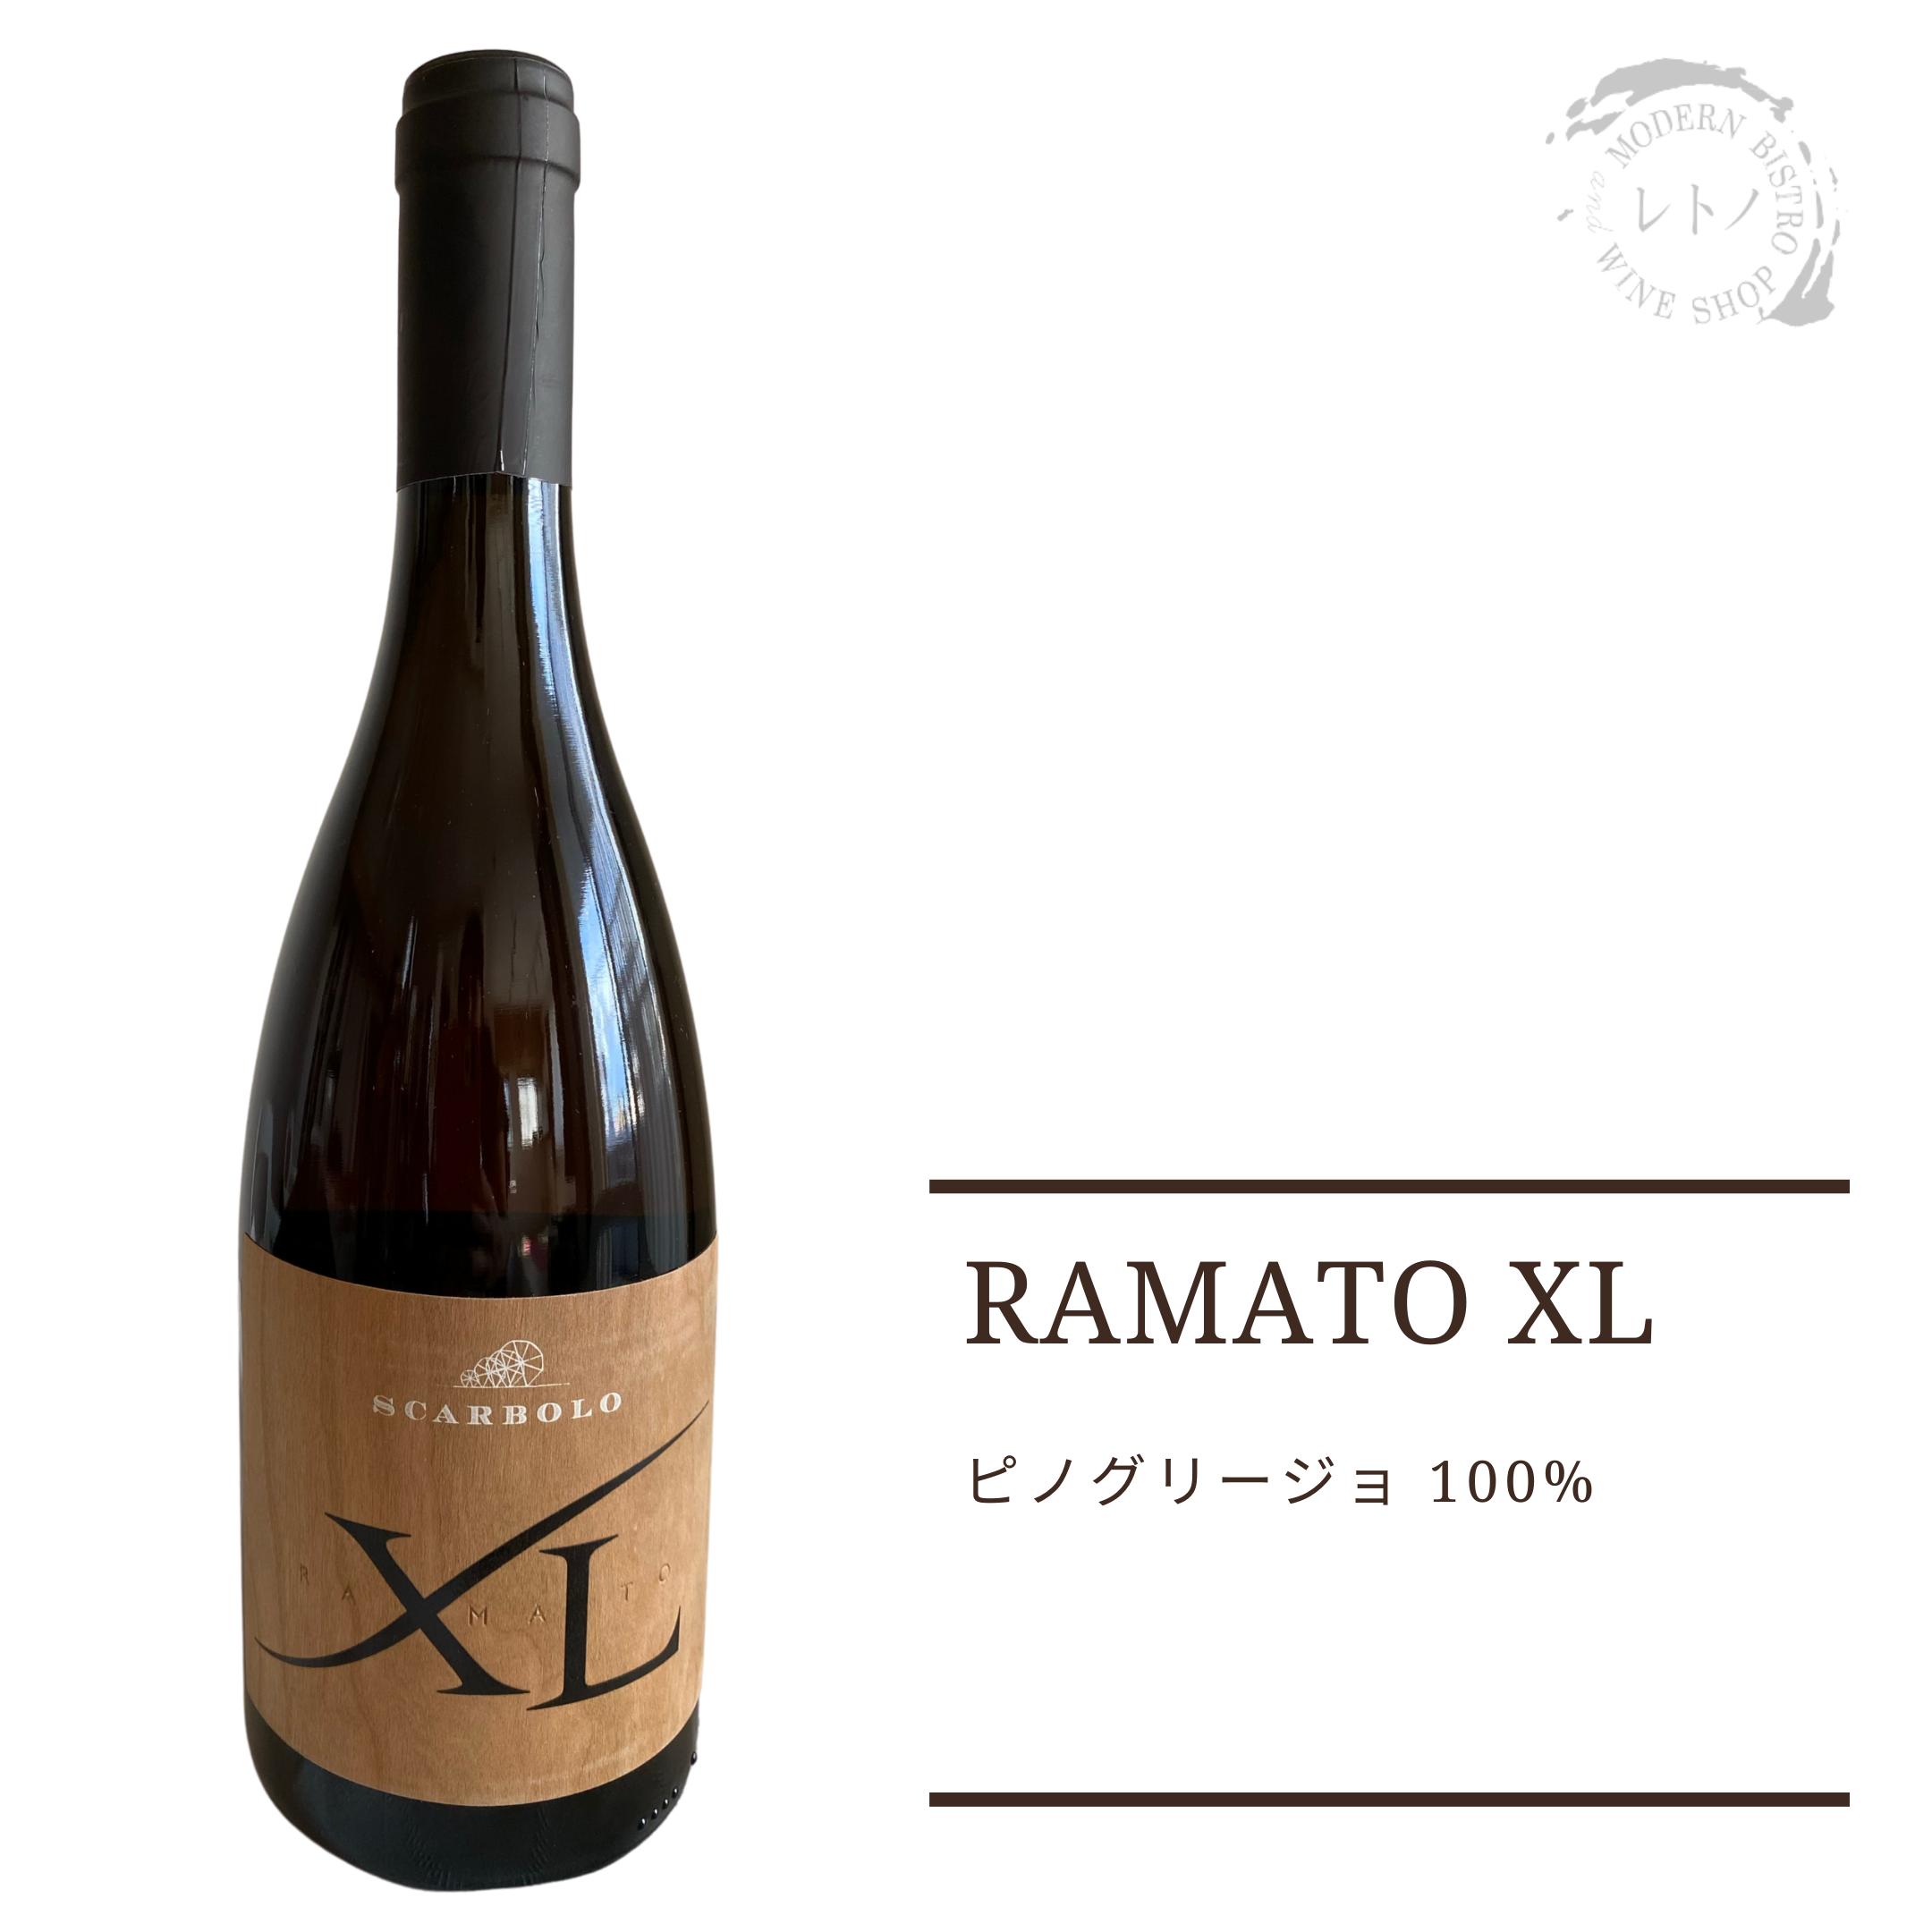 2018 RAMATO XL, ITALY, PINO GRIGIO